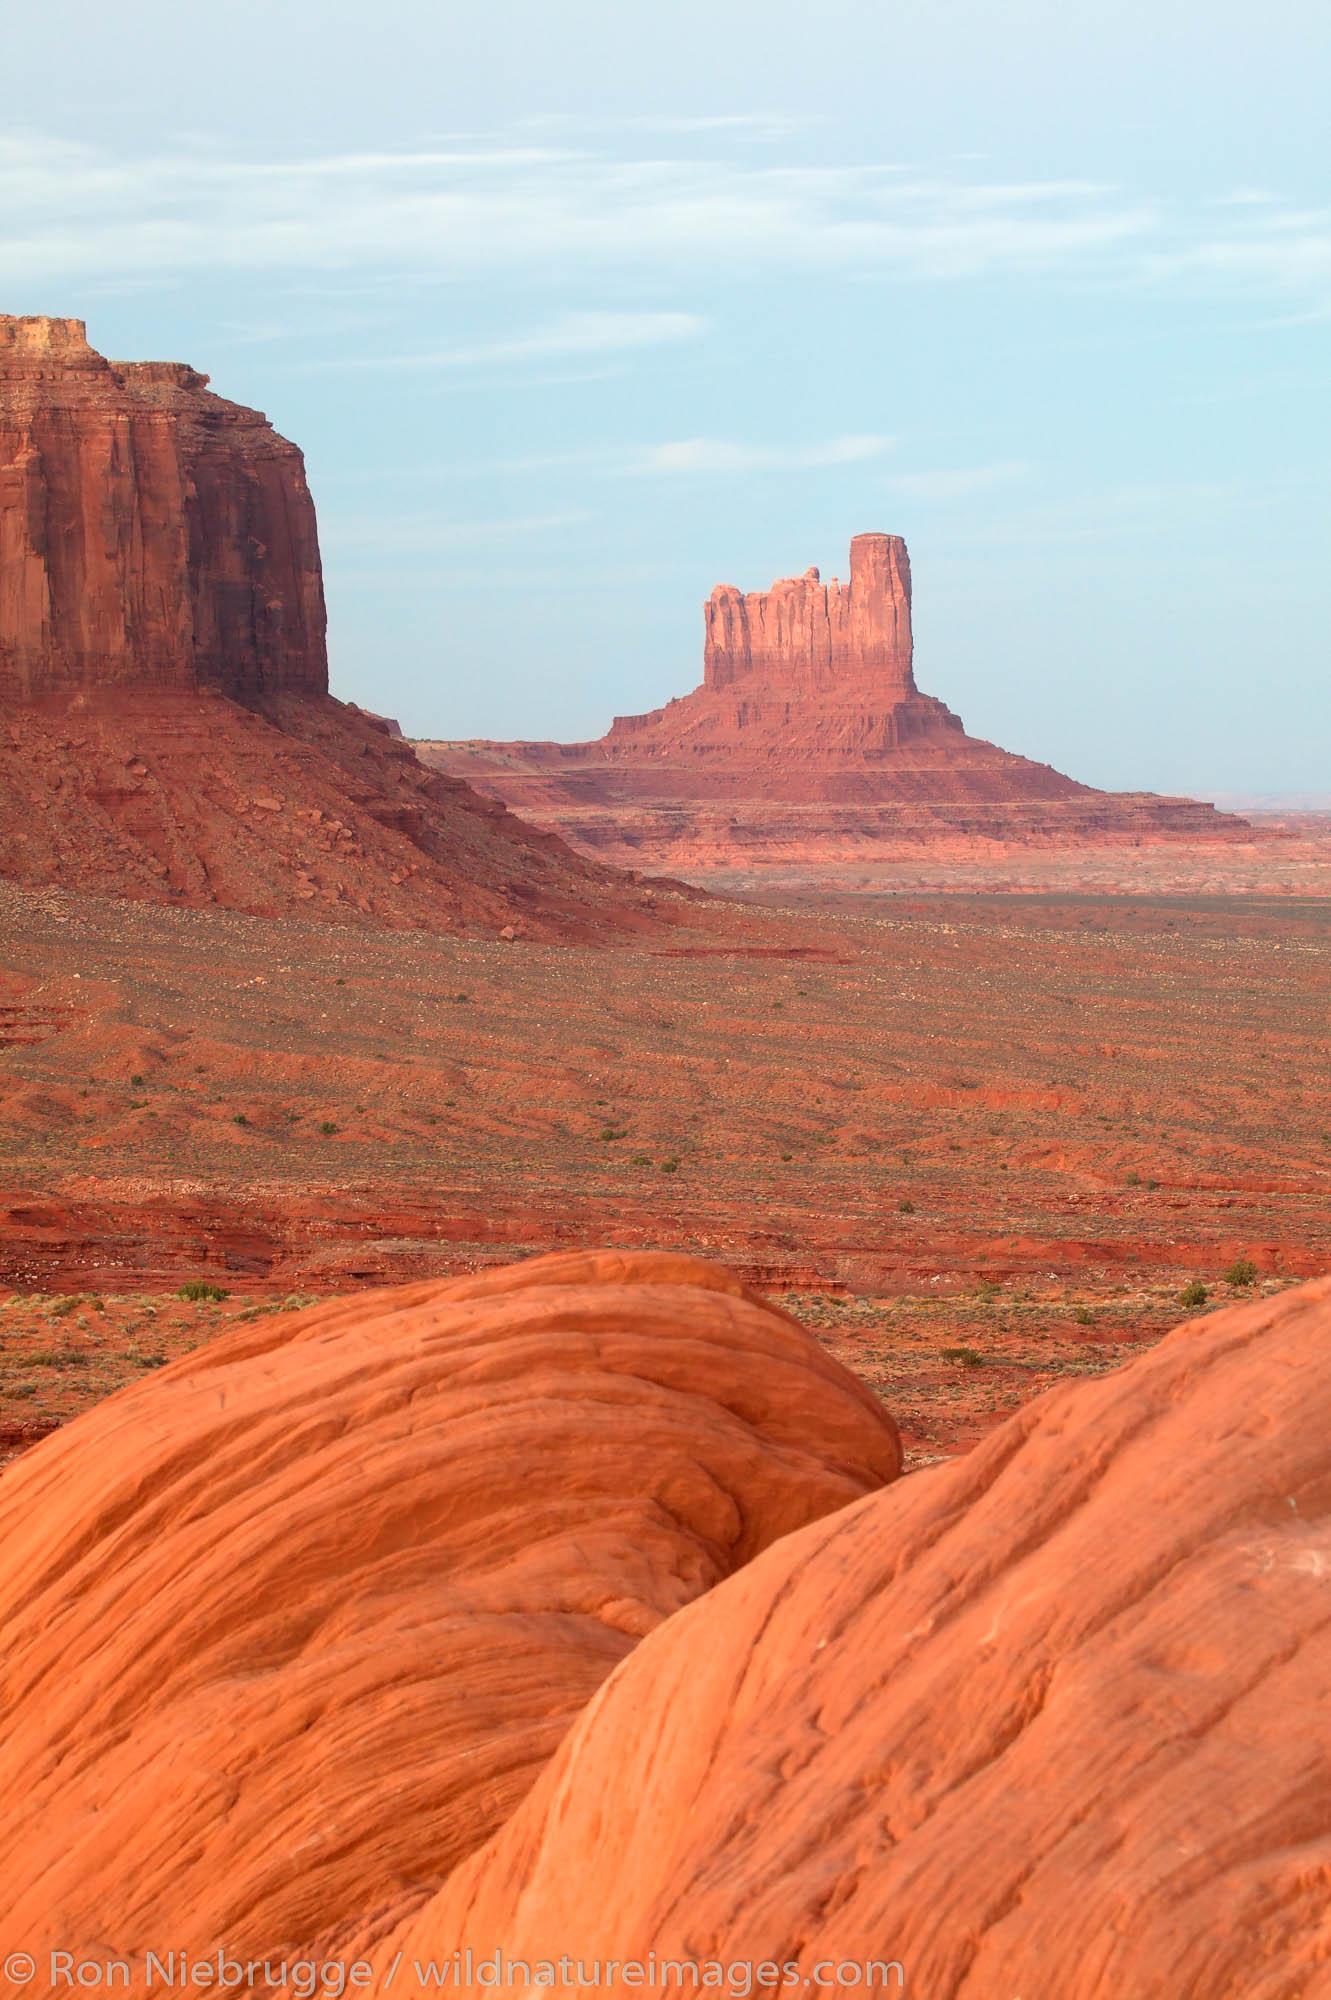 Monument Valley Navajo Tribal Park, Utah.